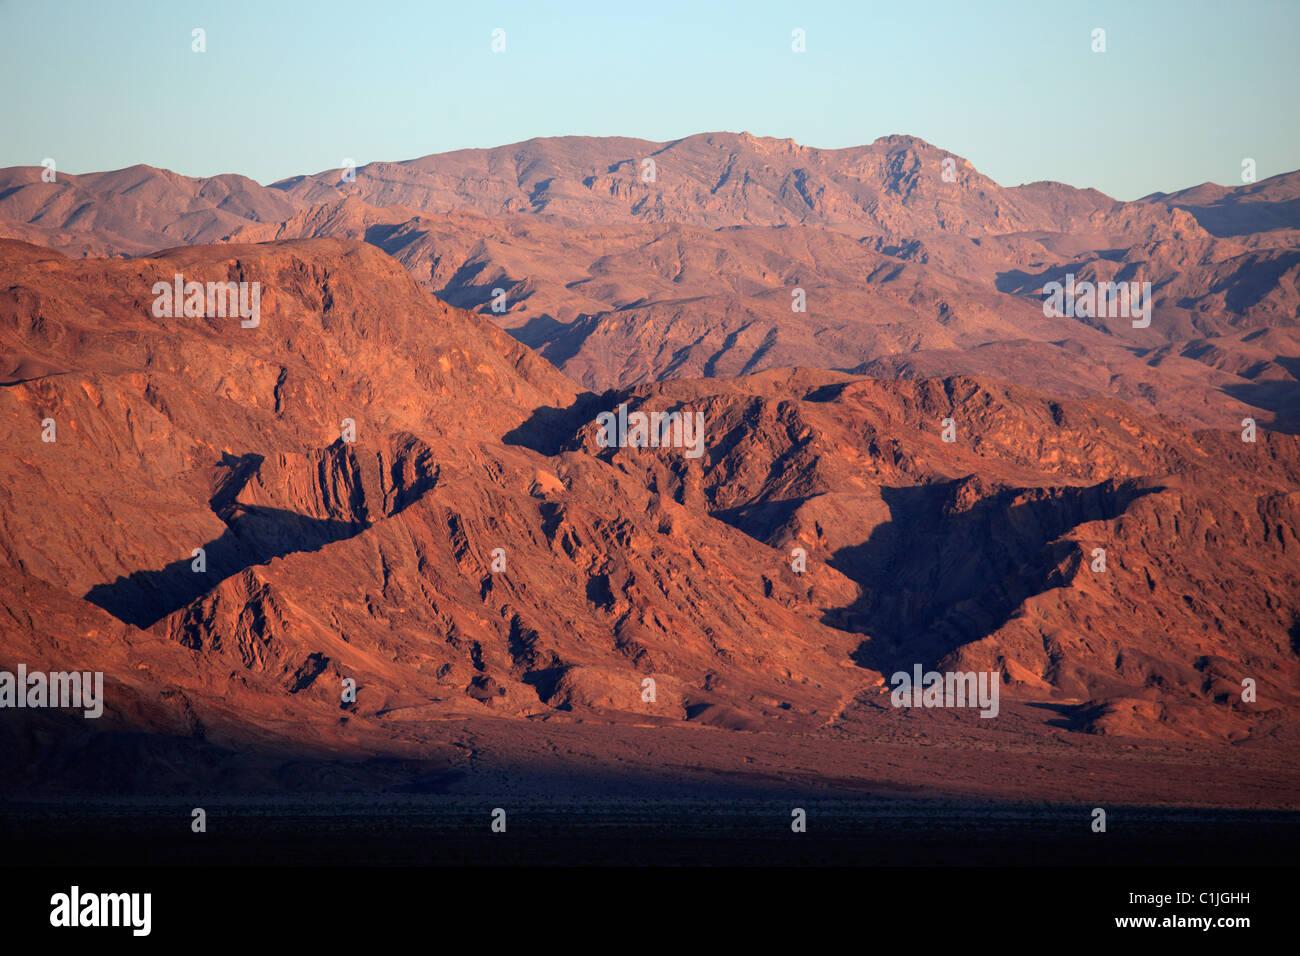 USA, California, Death Valley, National Park, Panamint Range, - Stock Image